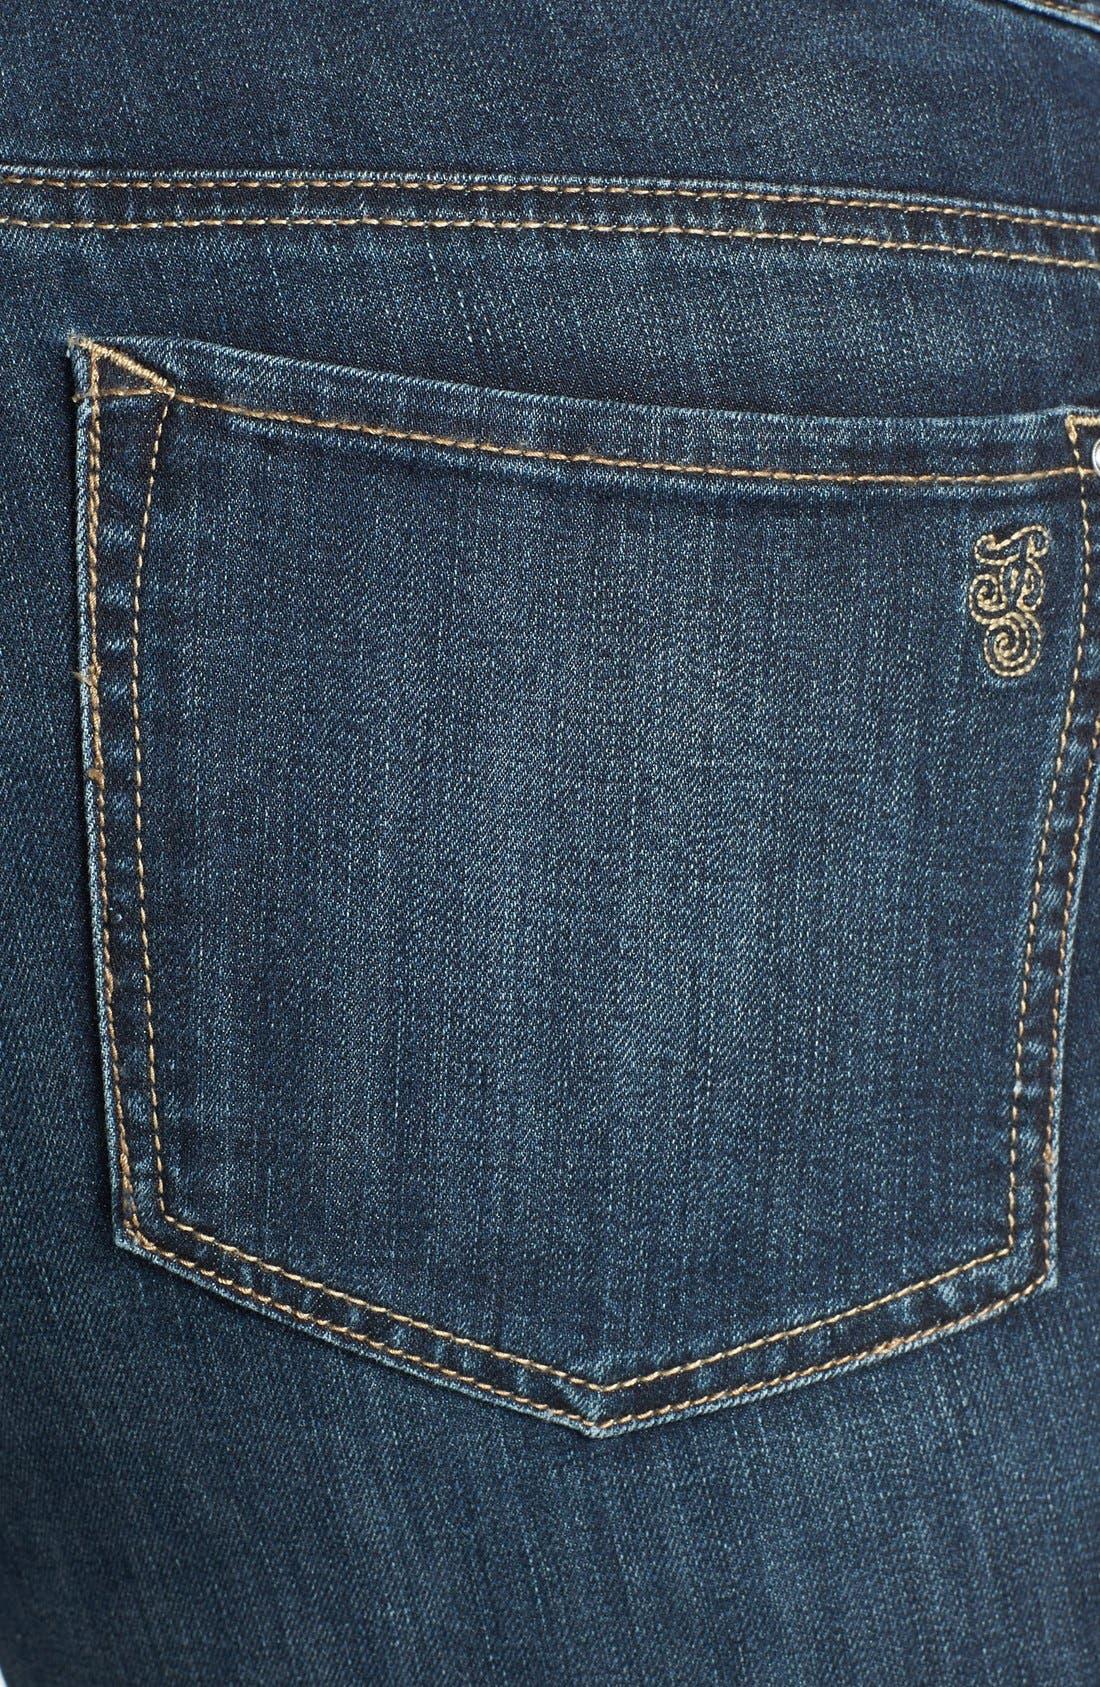 Alternate Image 3  - Jessica Simpson 'Kiss Me' Stretch Skinny Jeans (Plus Size)